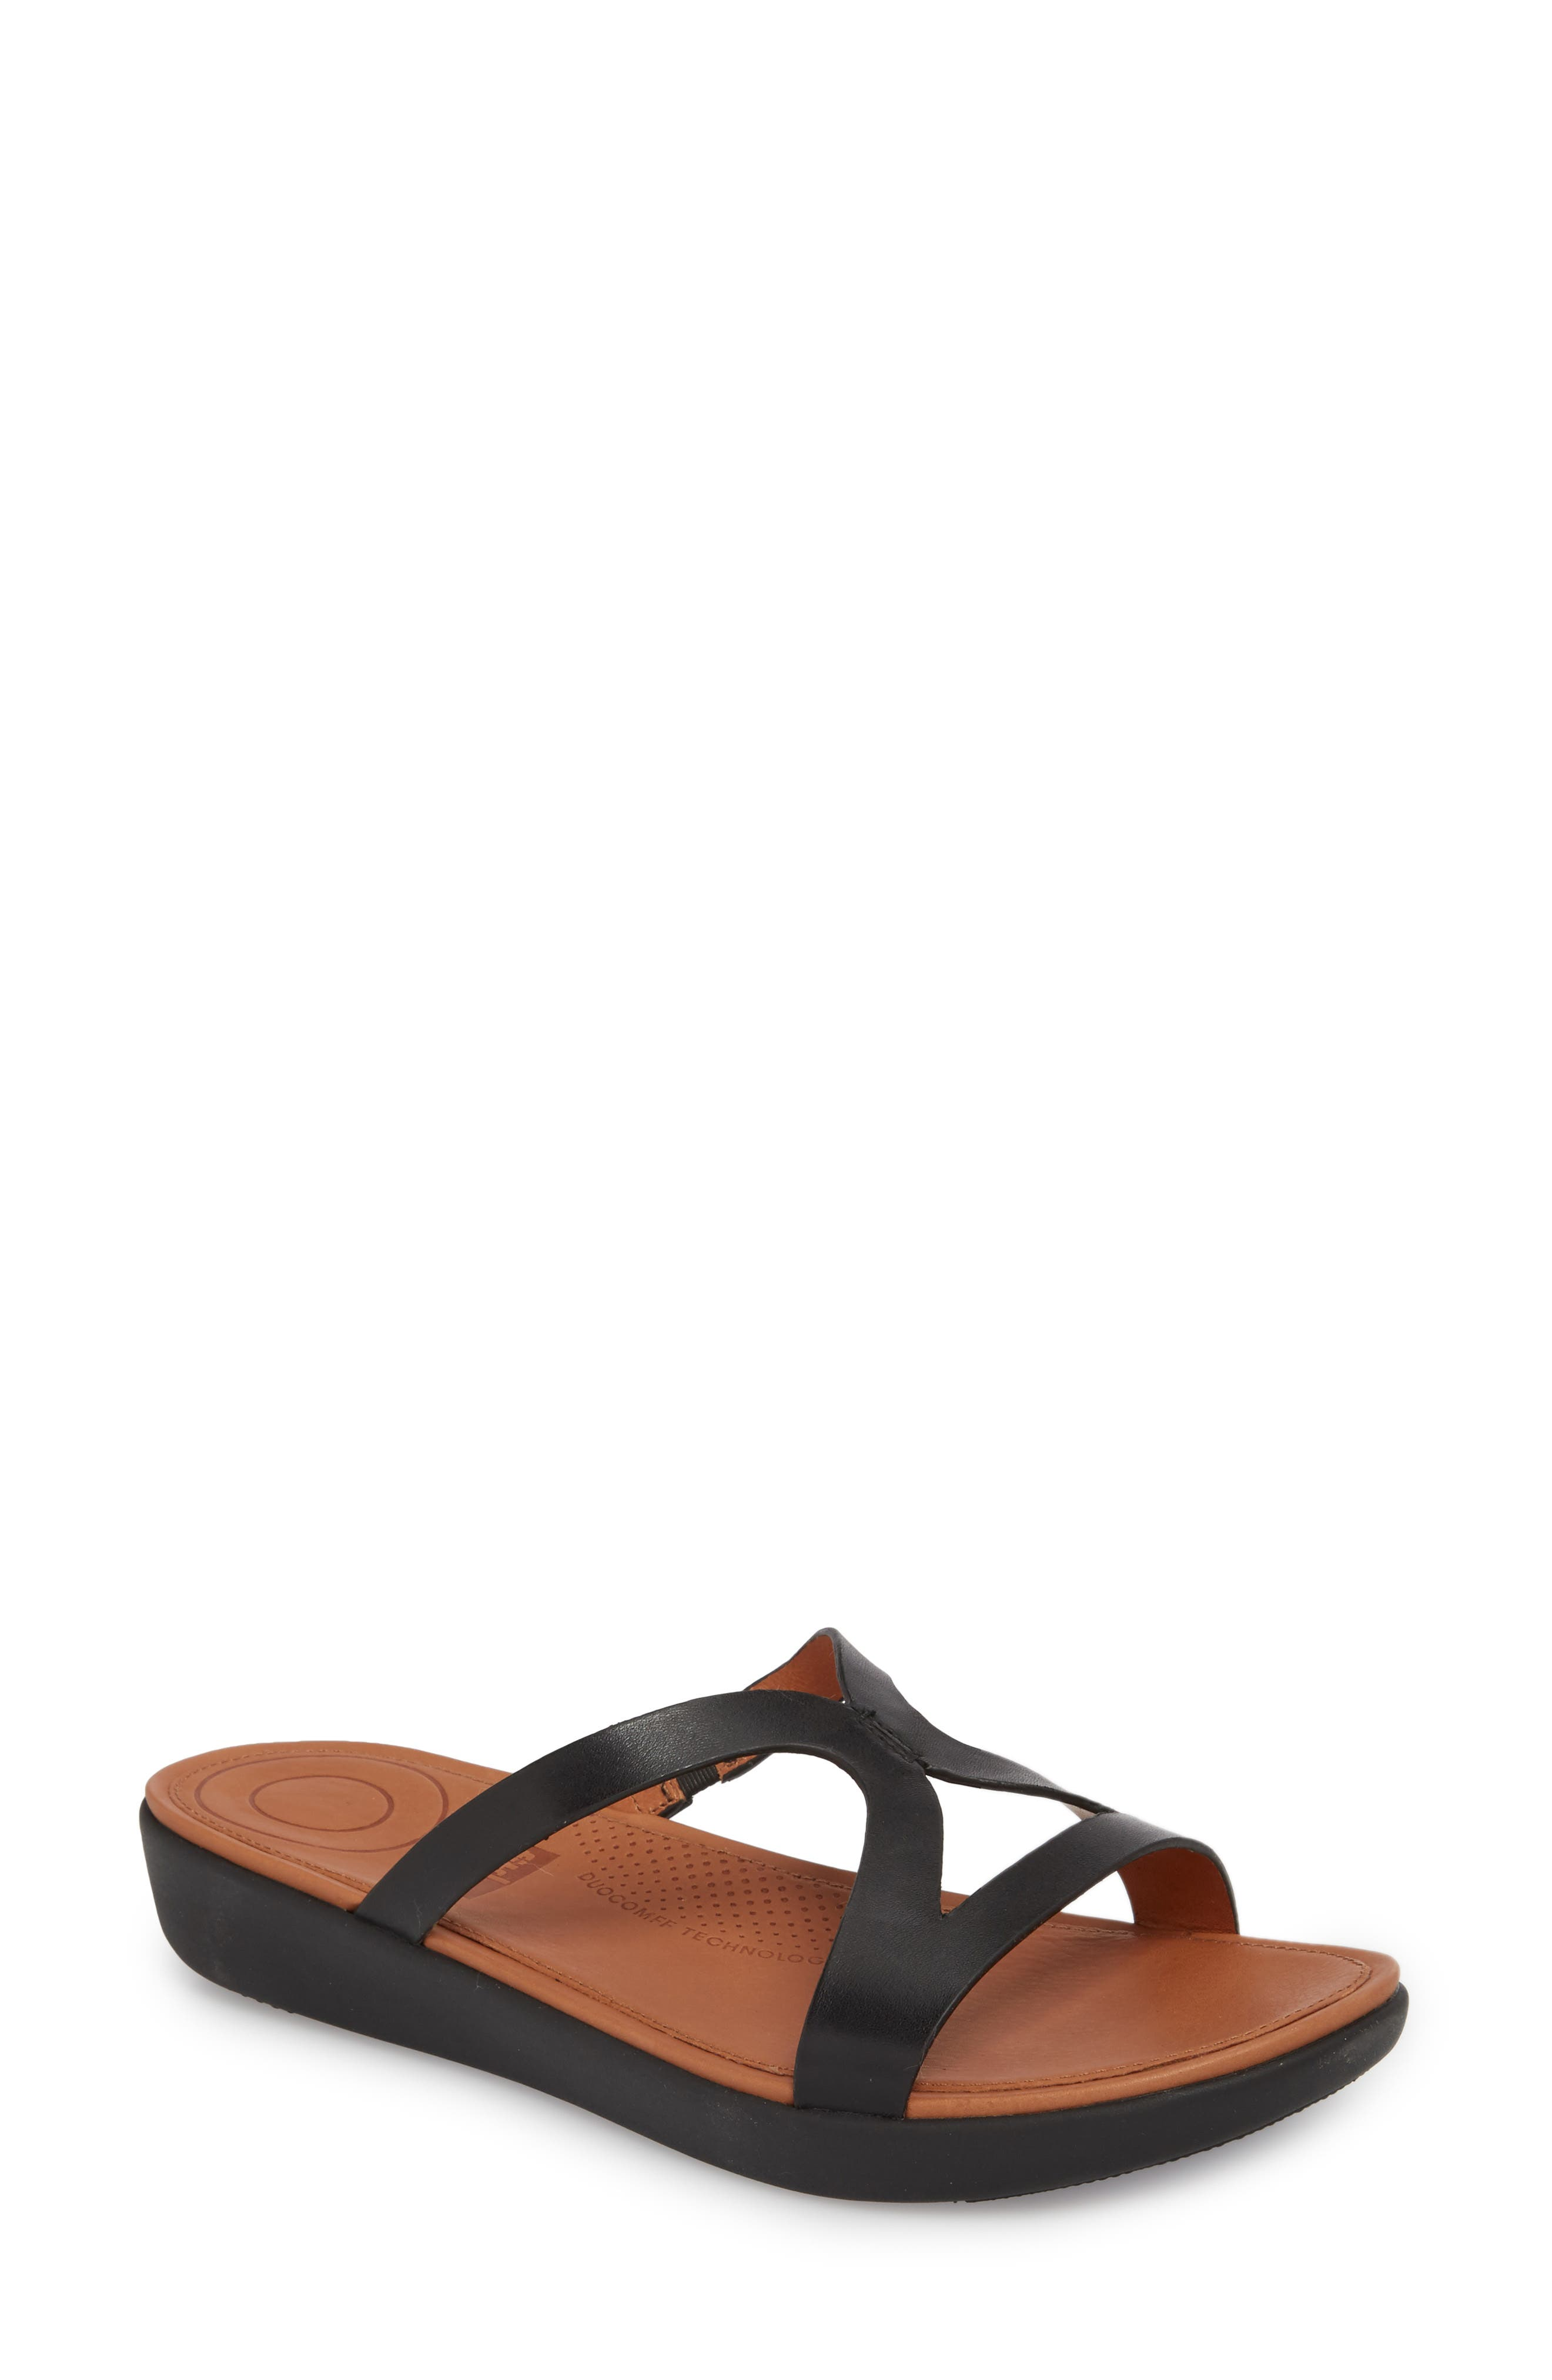 FITFLOP Strata Slide Sandals, Main, color, 001